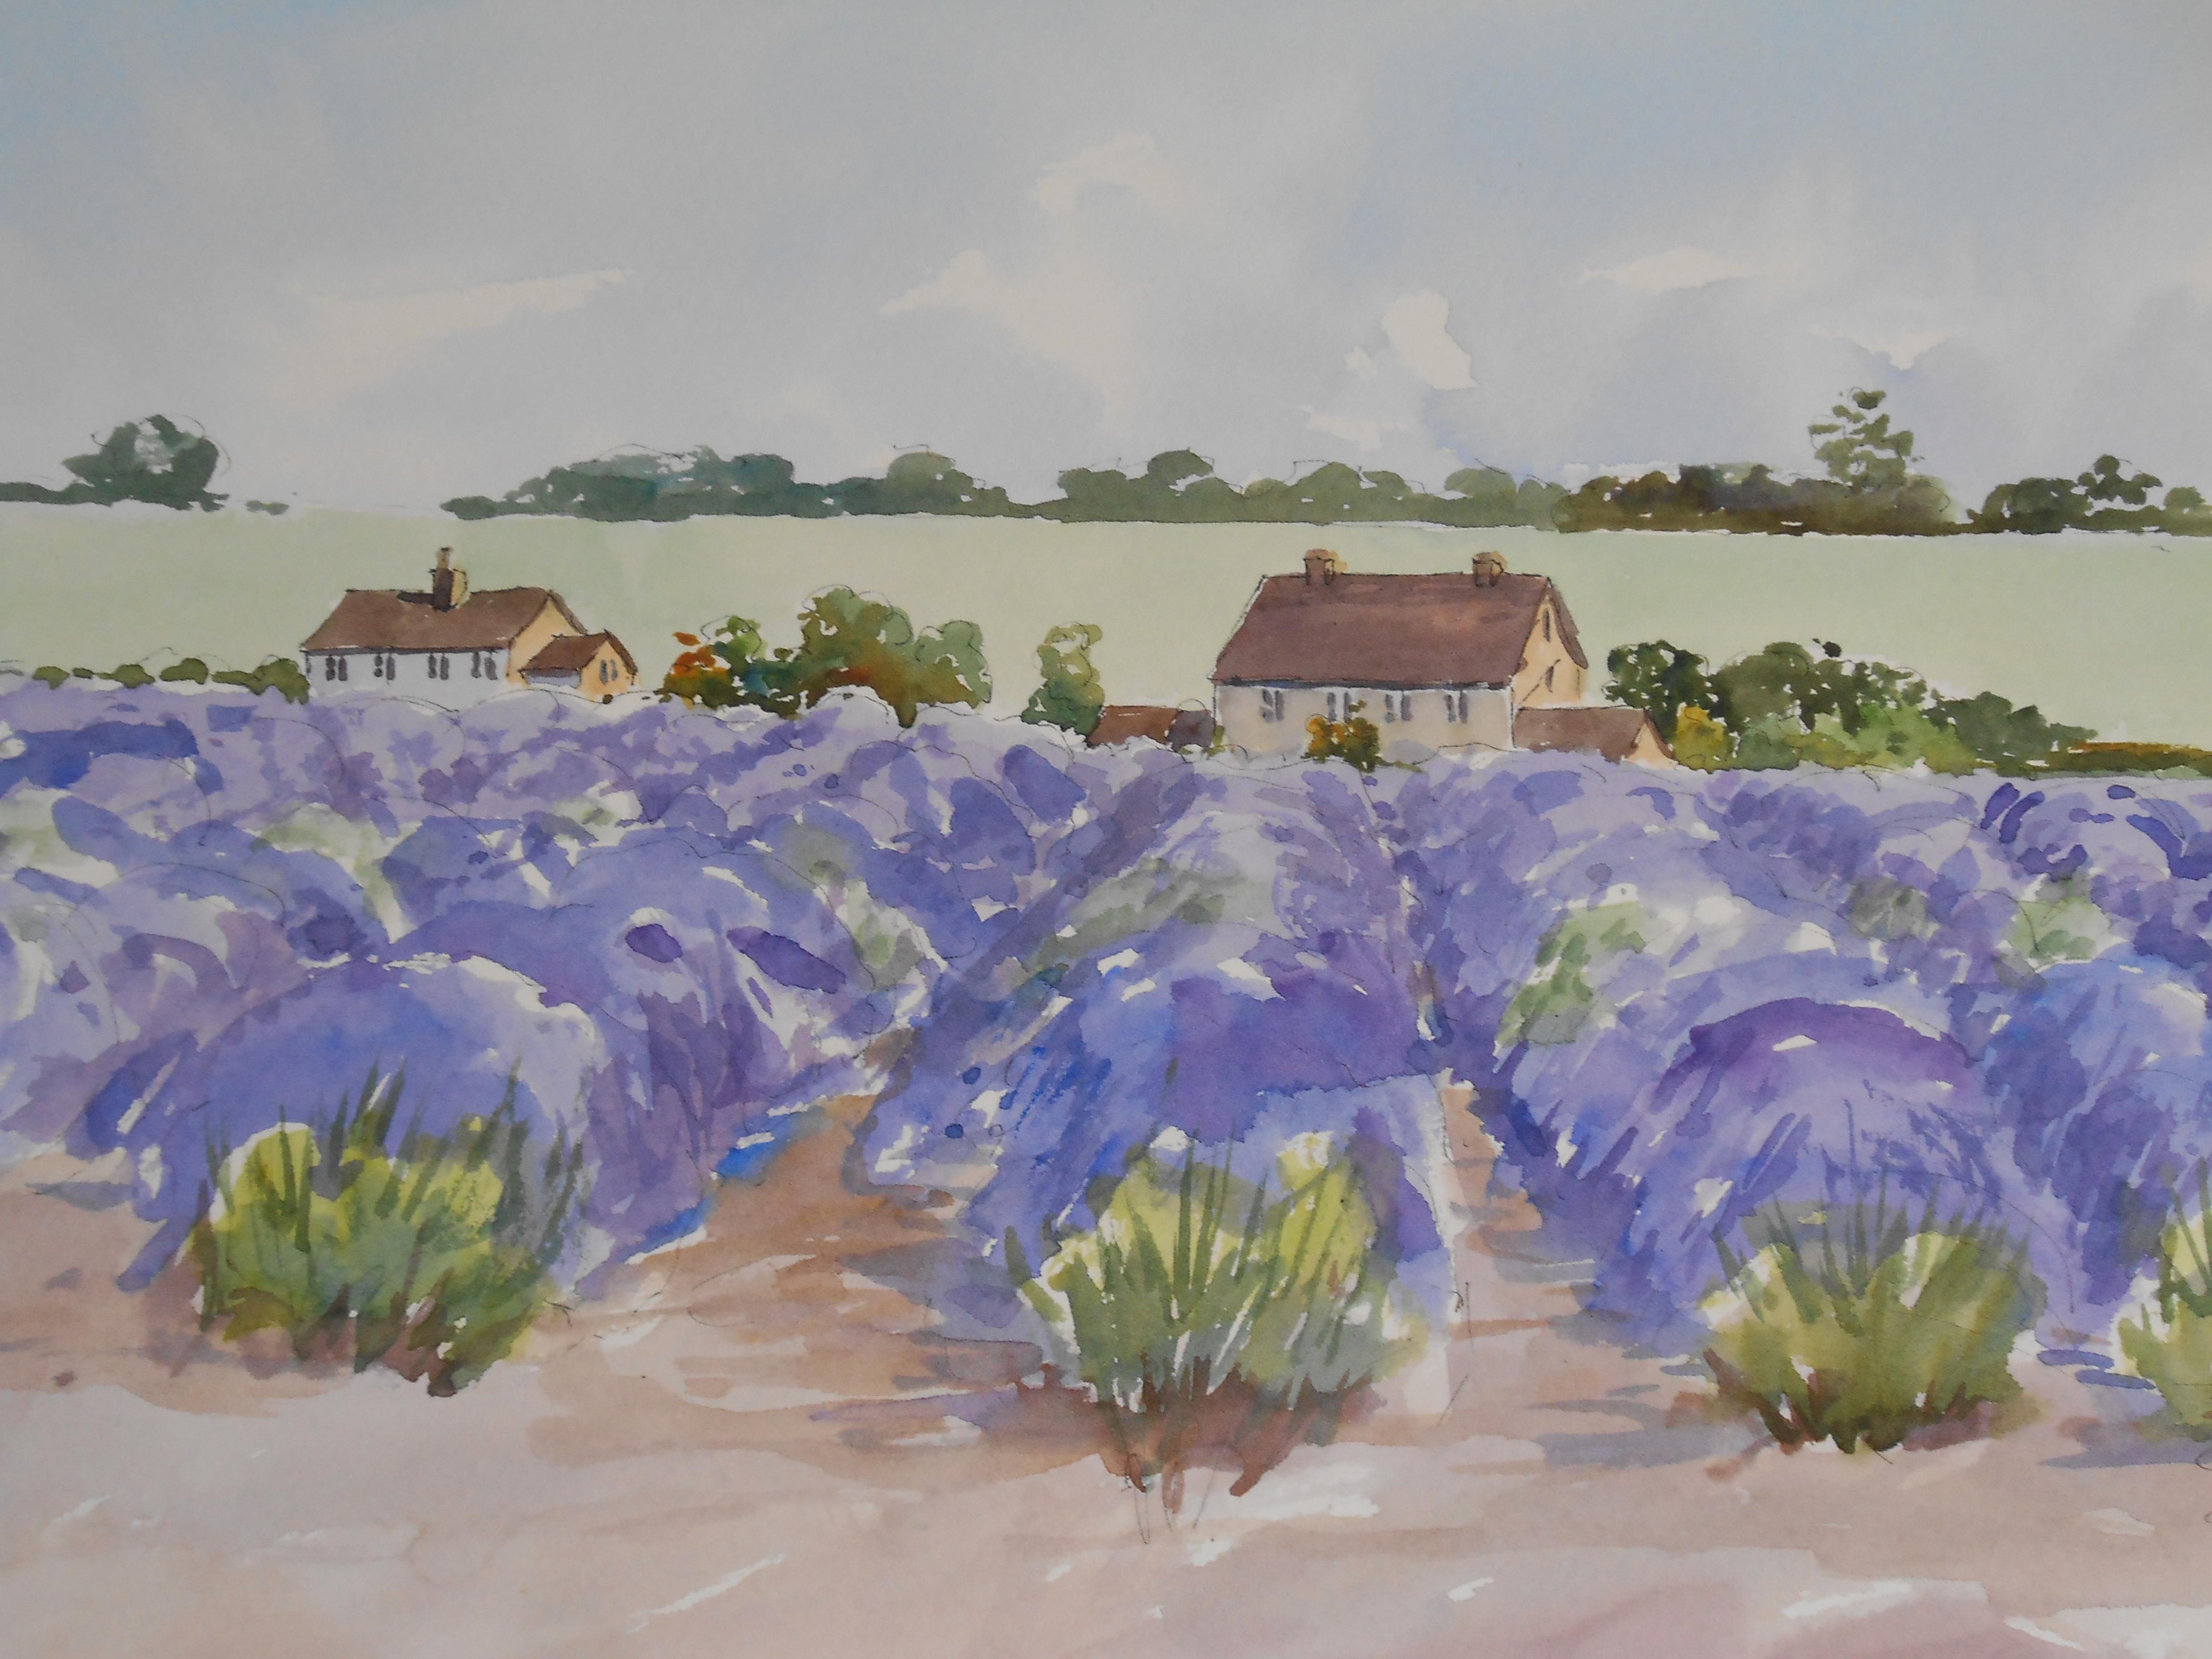 07-22 Snowshill Lavender